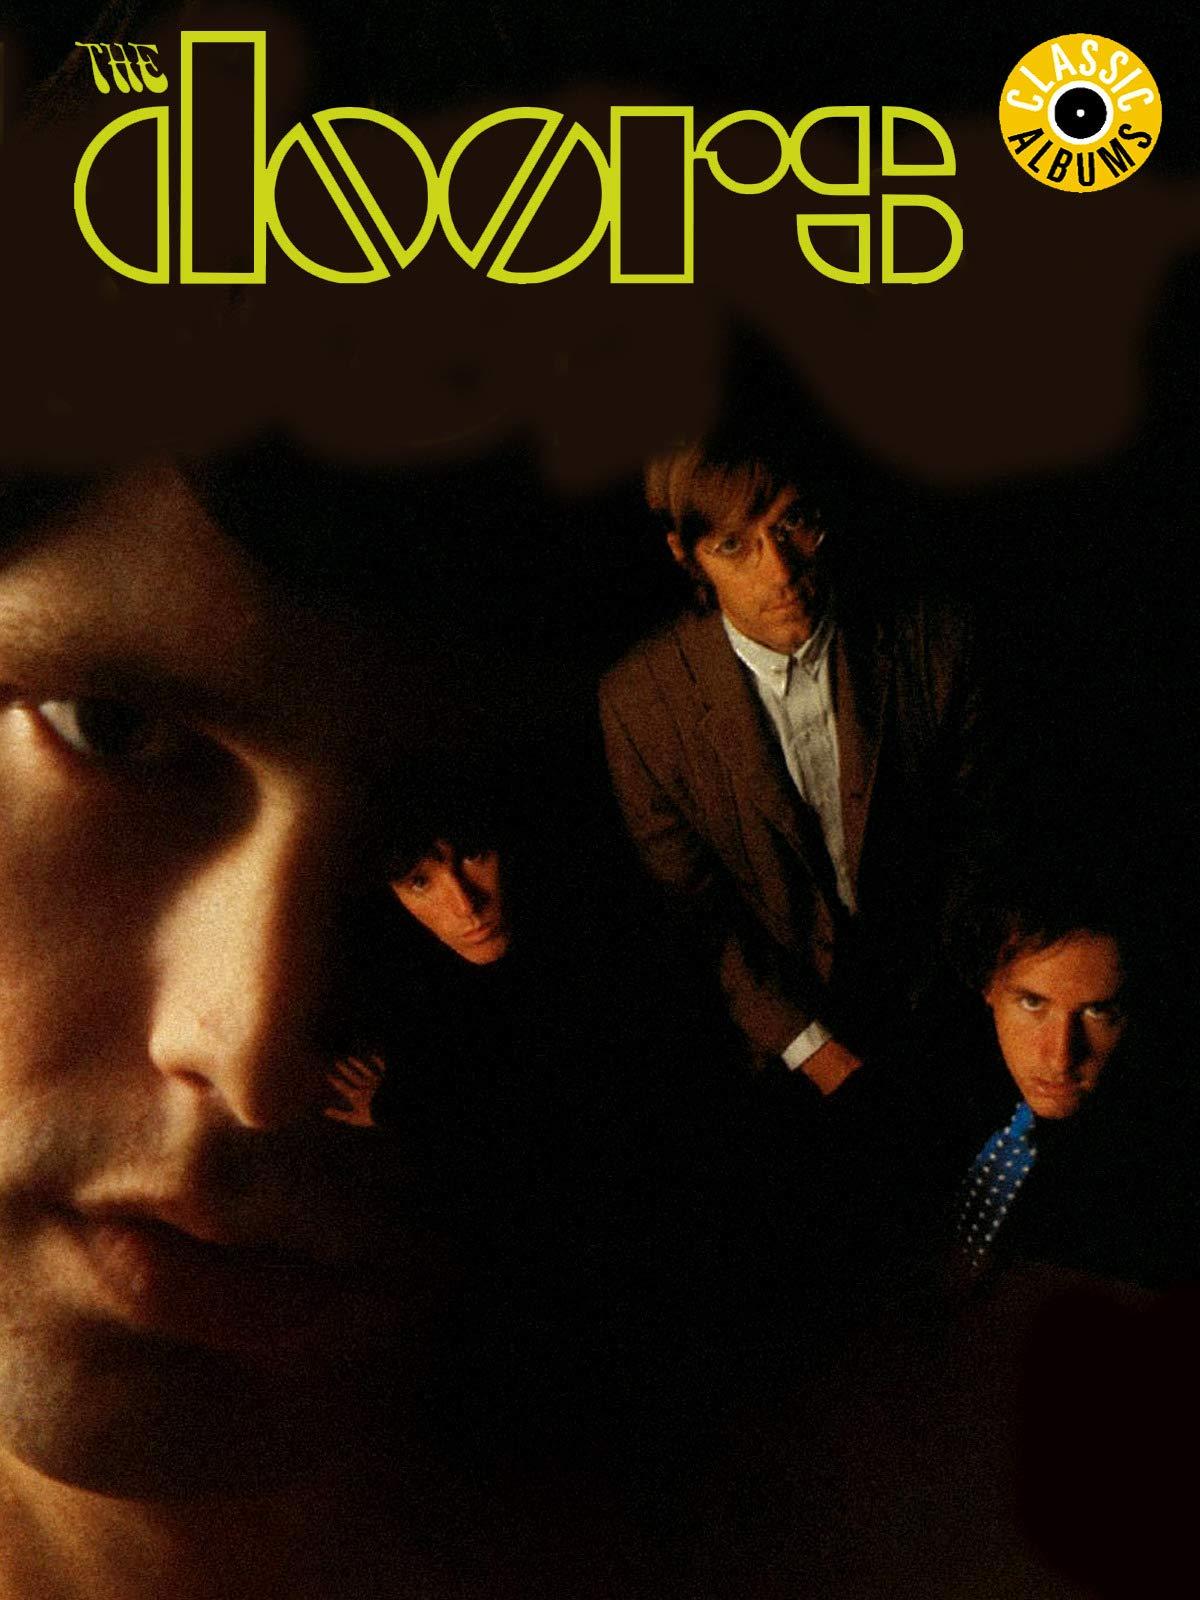 The Doors - The Doors (Classic Album) on Amazon Prime Video UK